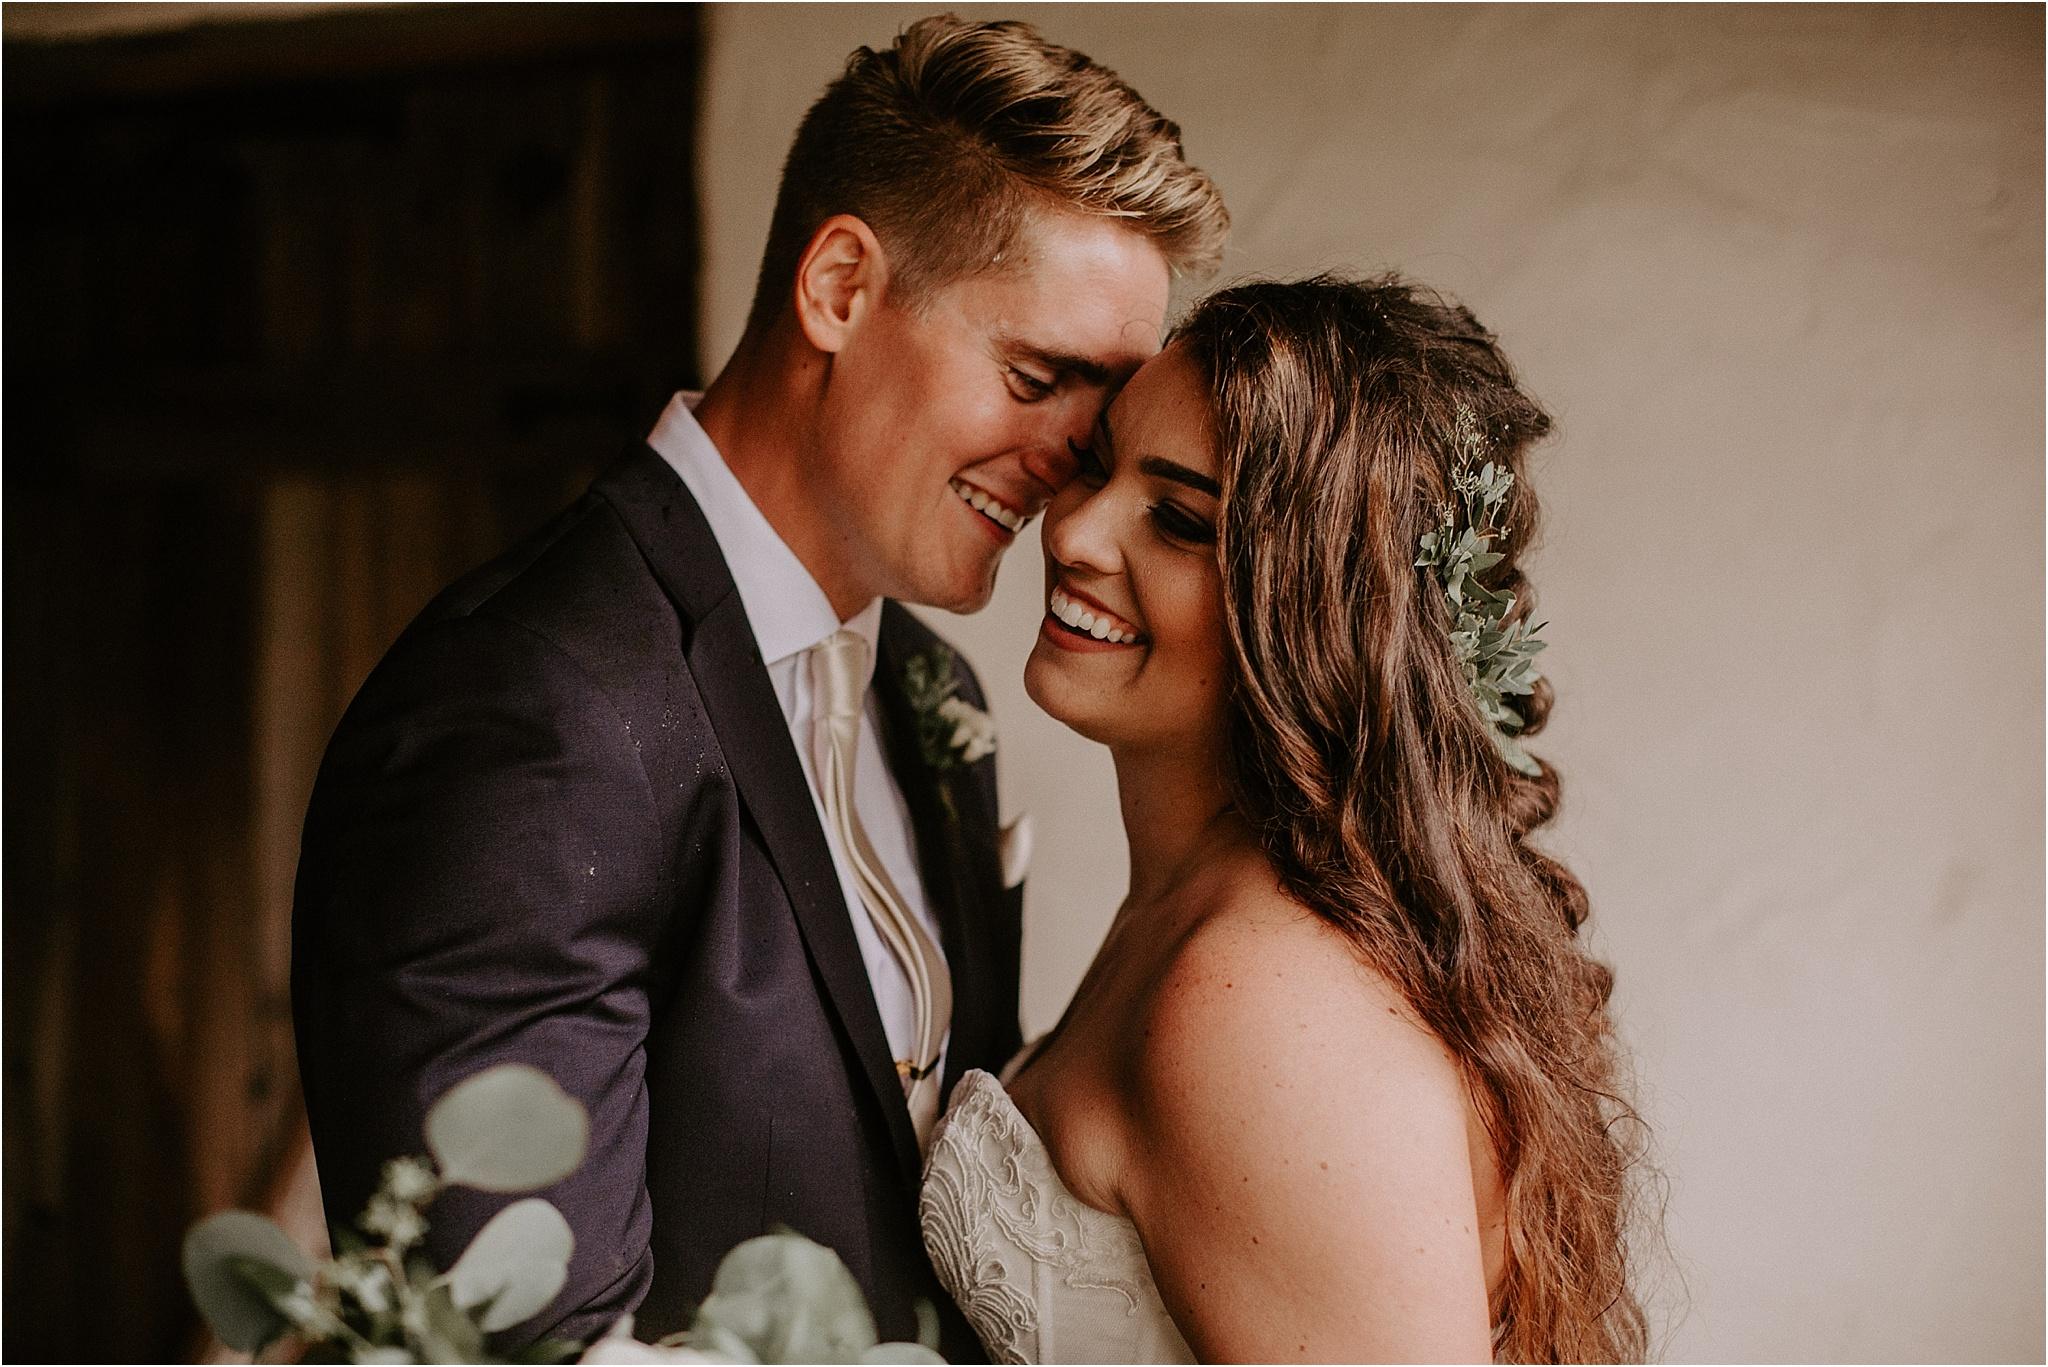 Sarah_Brookhart_Philadelphia_Wedding_Photographer_0013-1.jpg